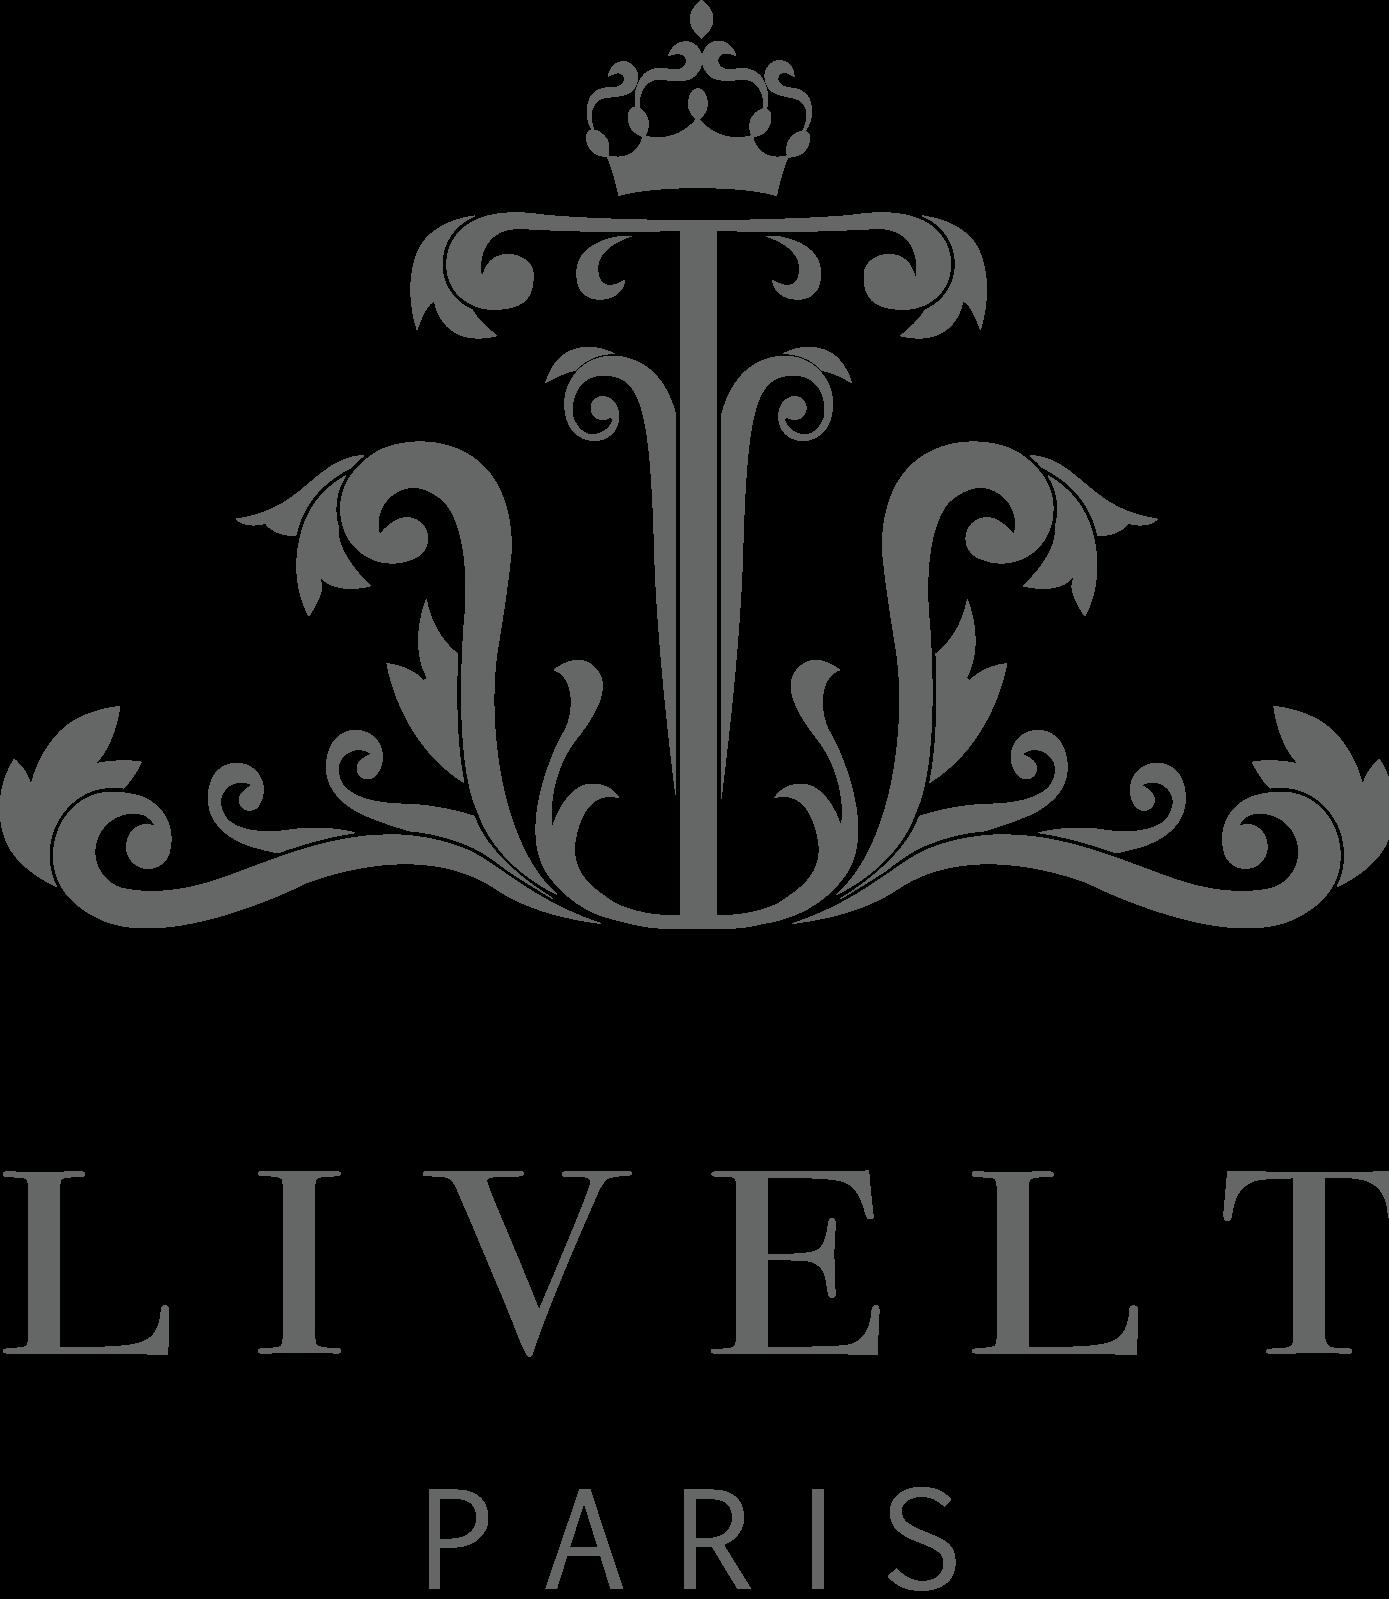 Livelt International-